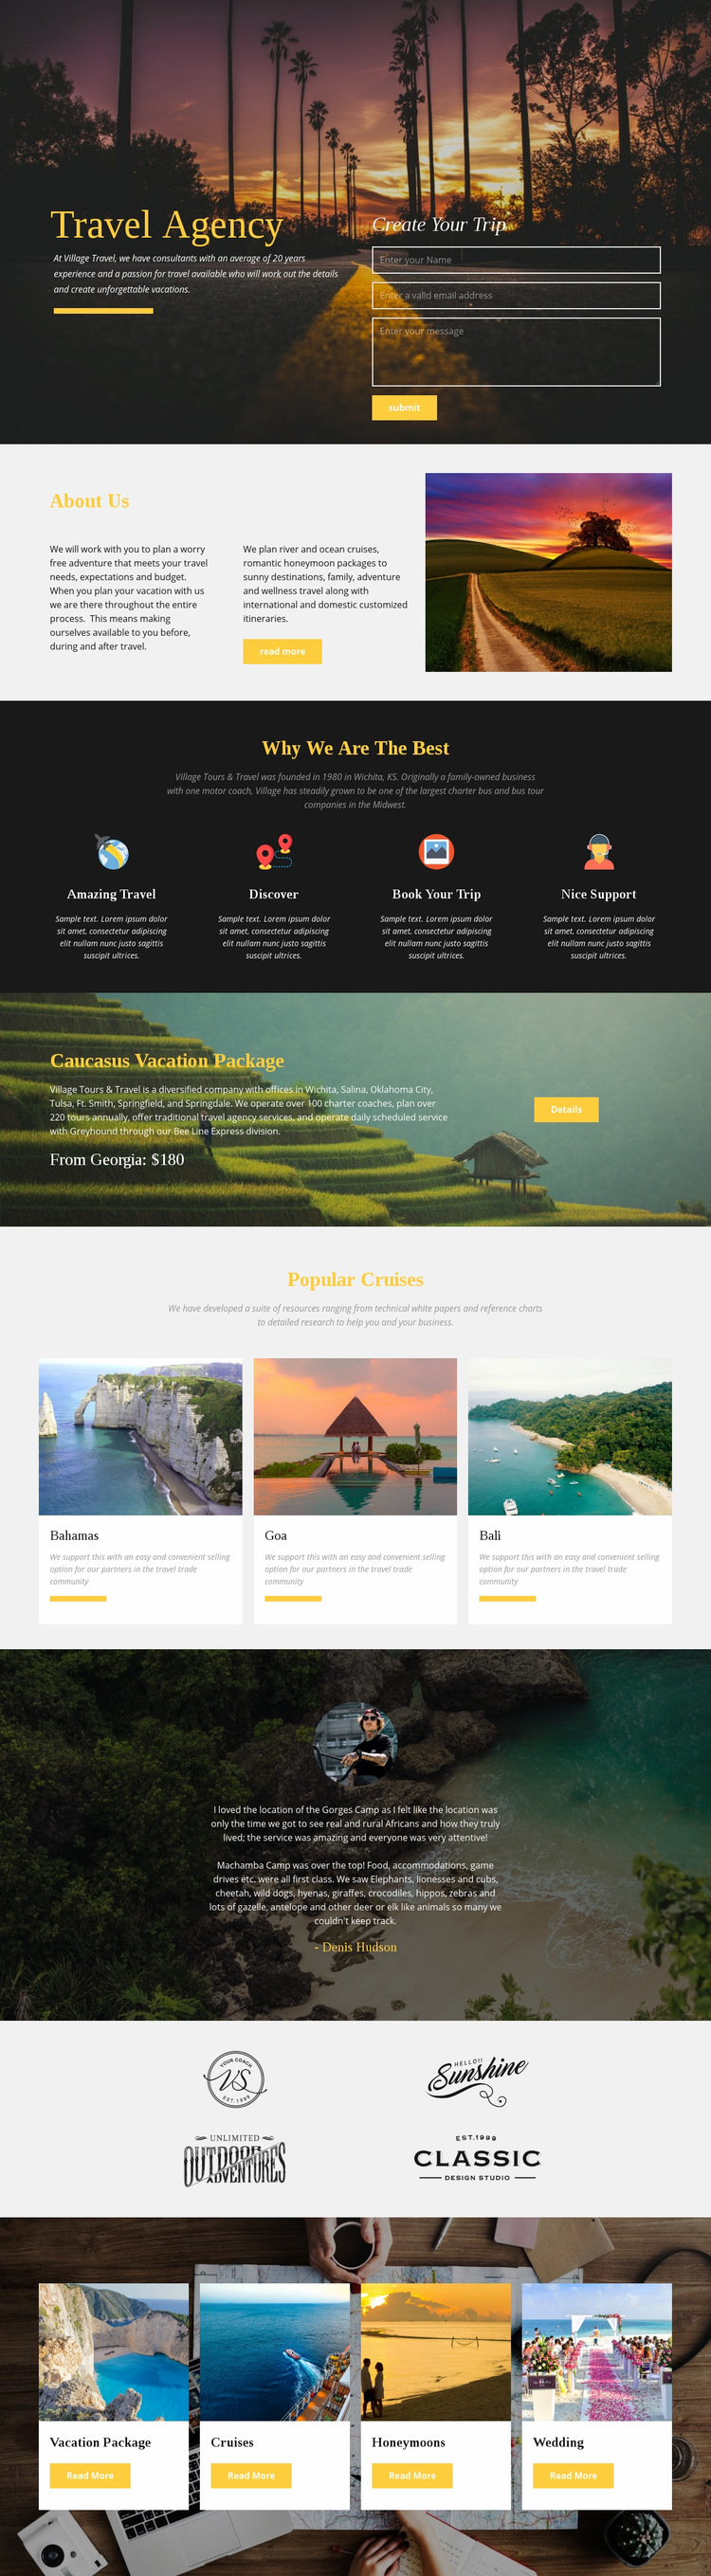 African safari tour company Web Page Design